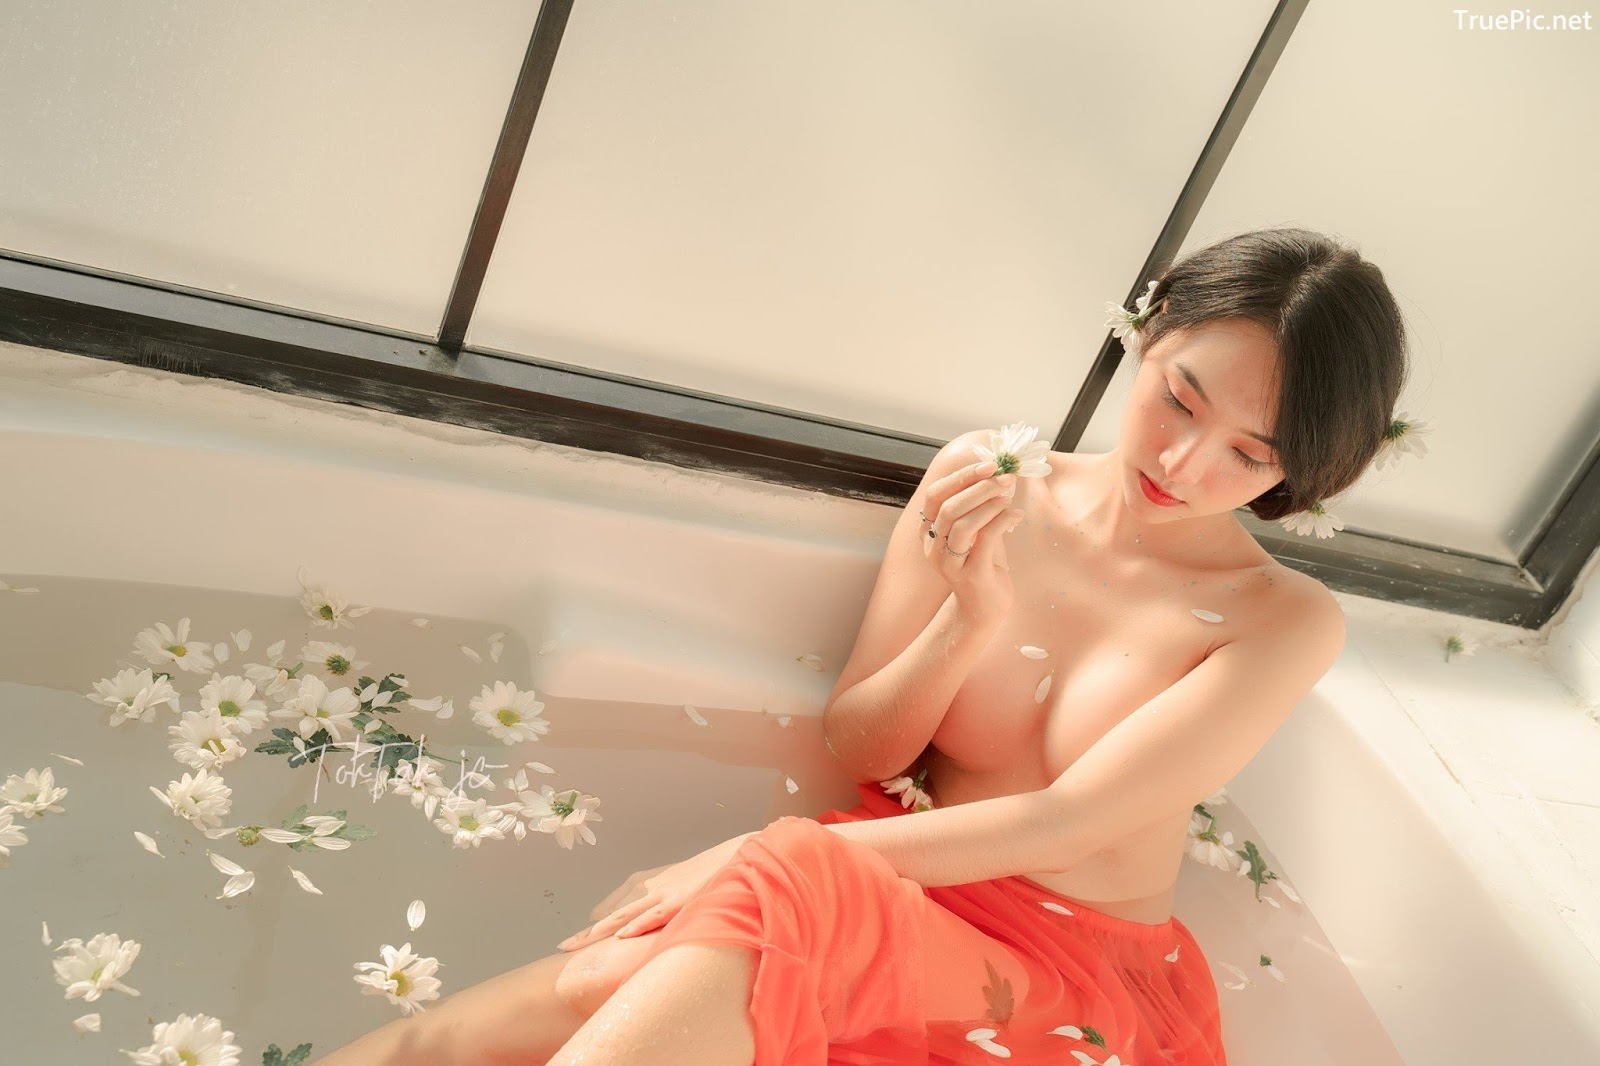 Image-Thailand-Beautiful-Model-Piyatida-Rotjutharak-The-Muse-Concept-TruePic.net- Picture-6